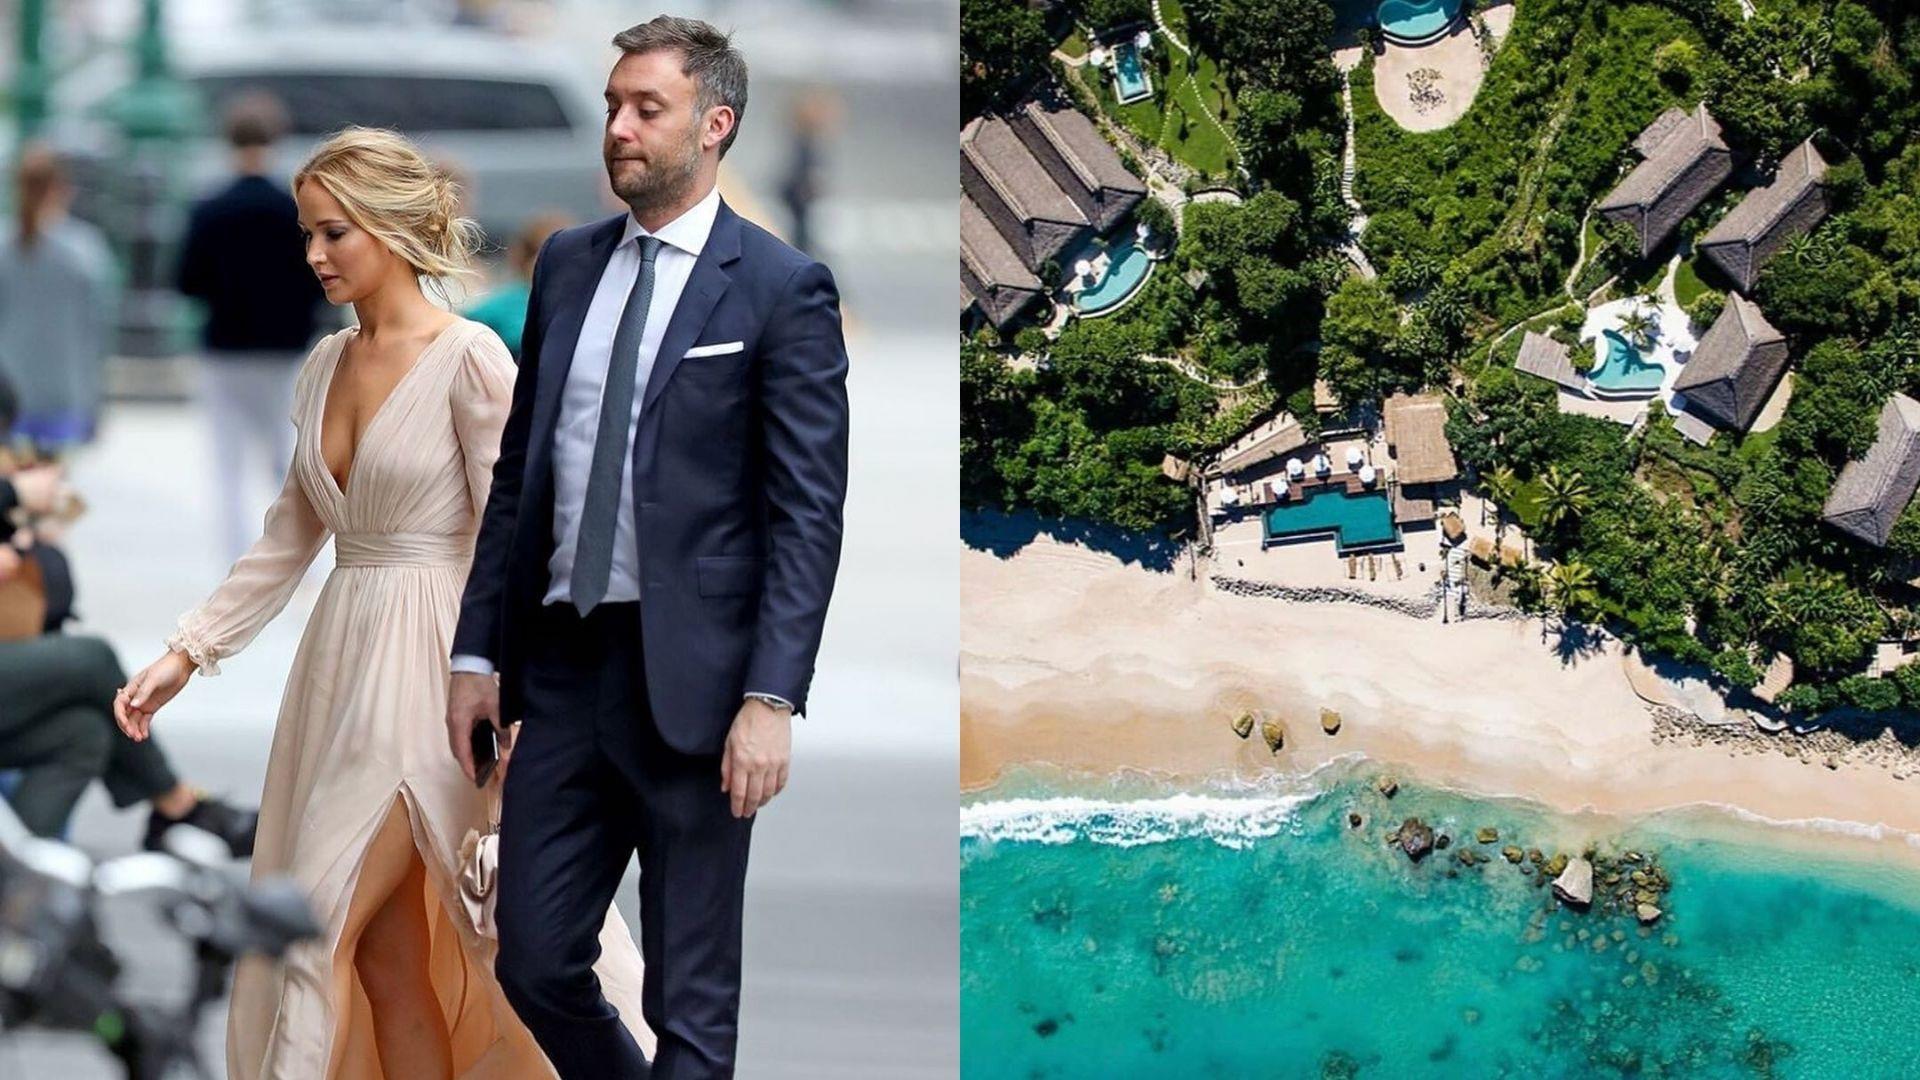 Inside Jennifer Lawrence And Cooke Maroney's Dreamy Honeymoon Destination